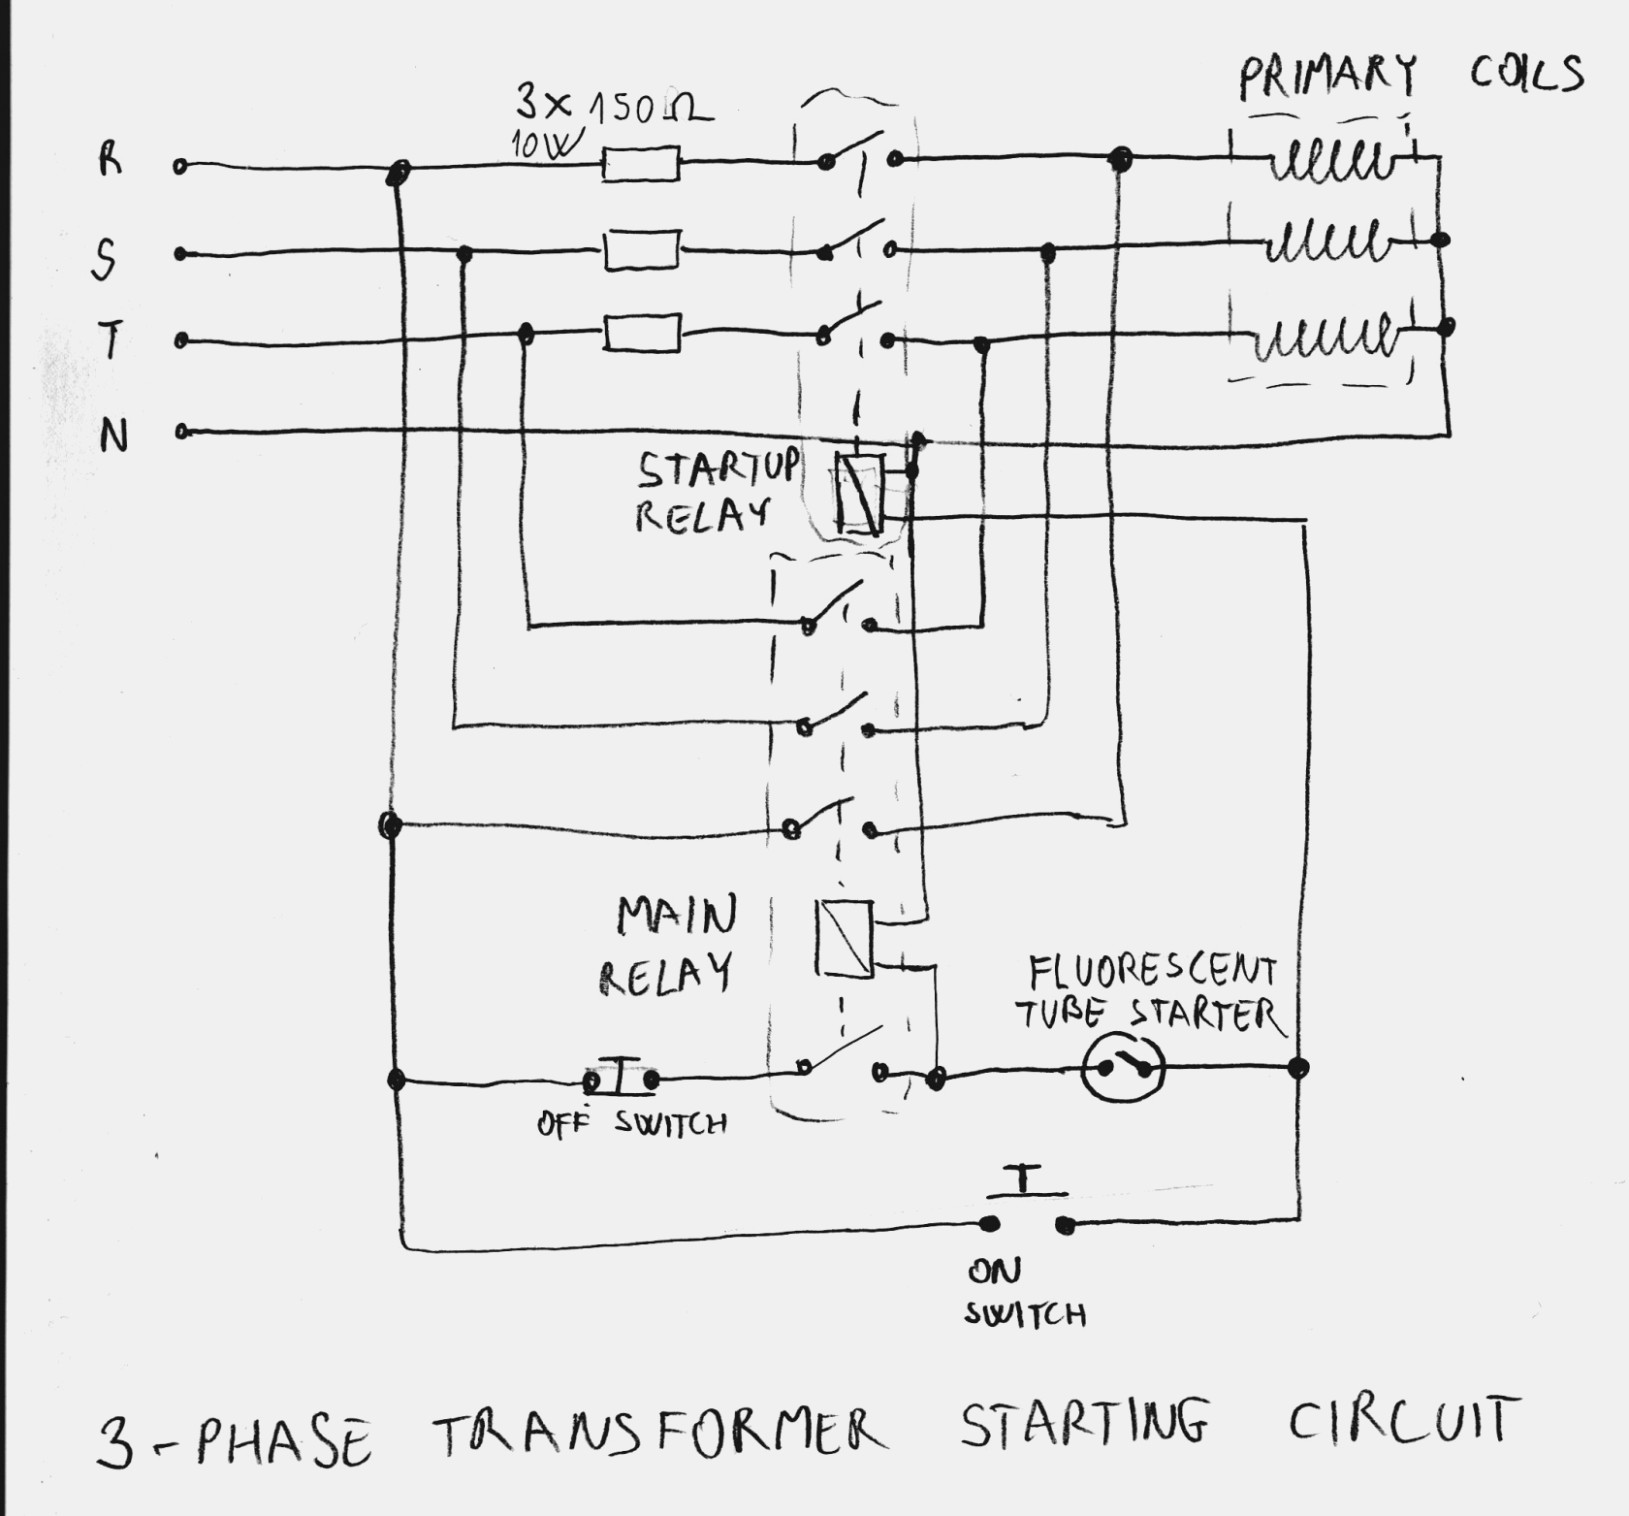 Yokoyama Control Transformer Wiring Diagram